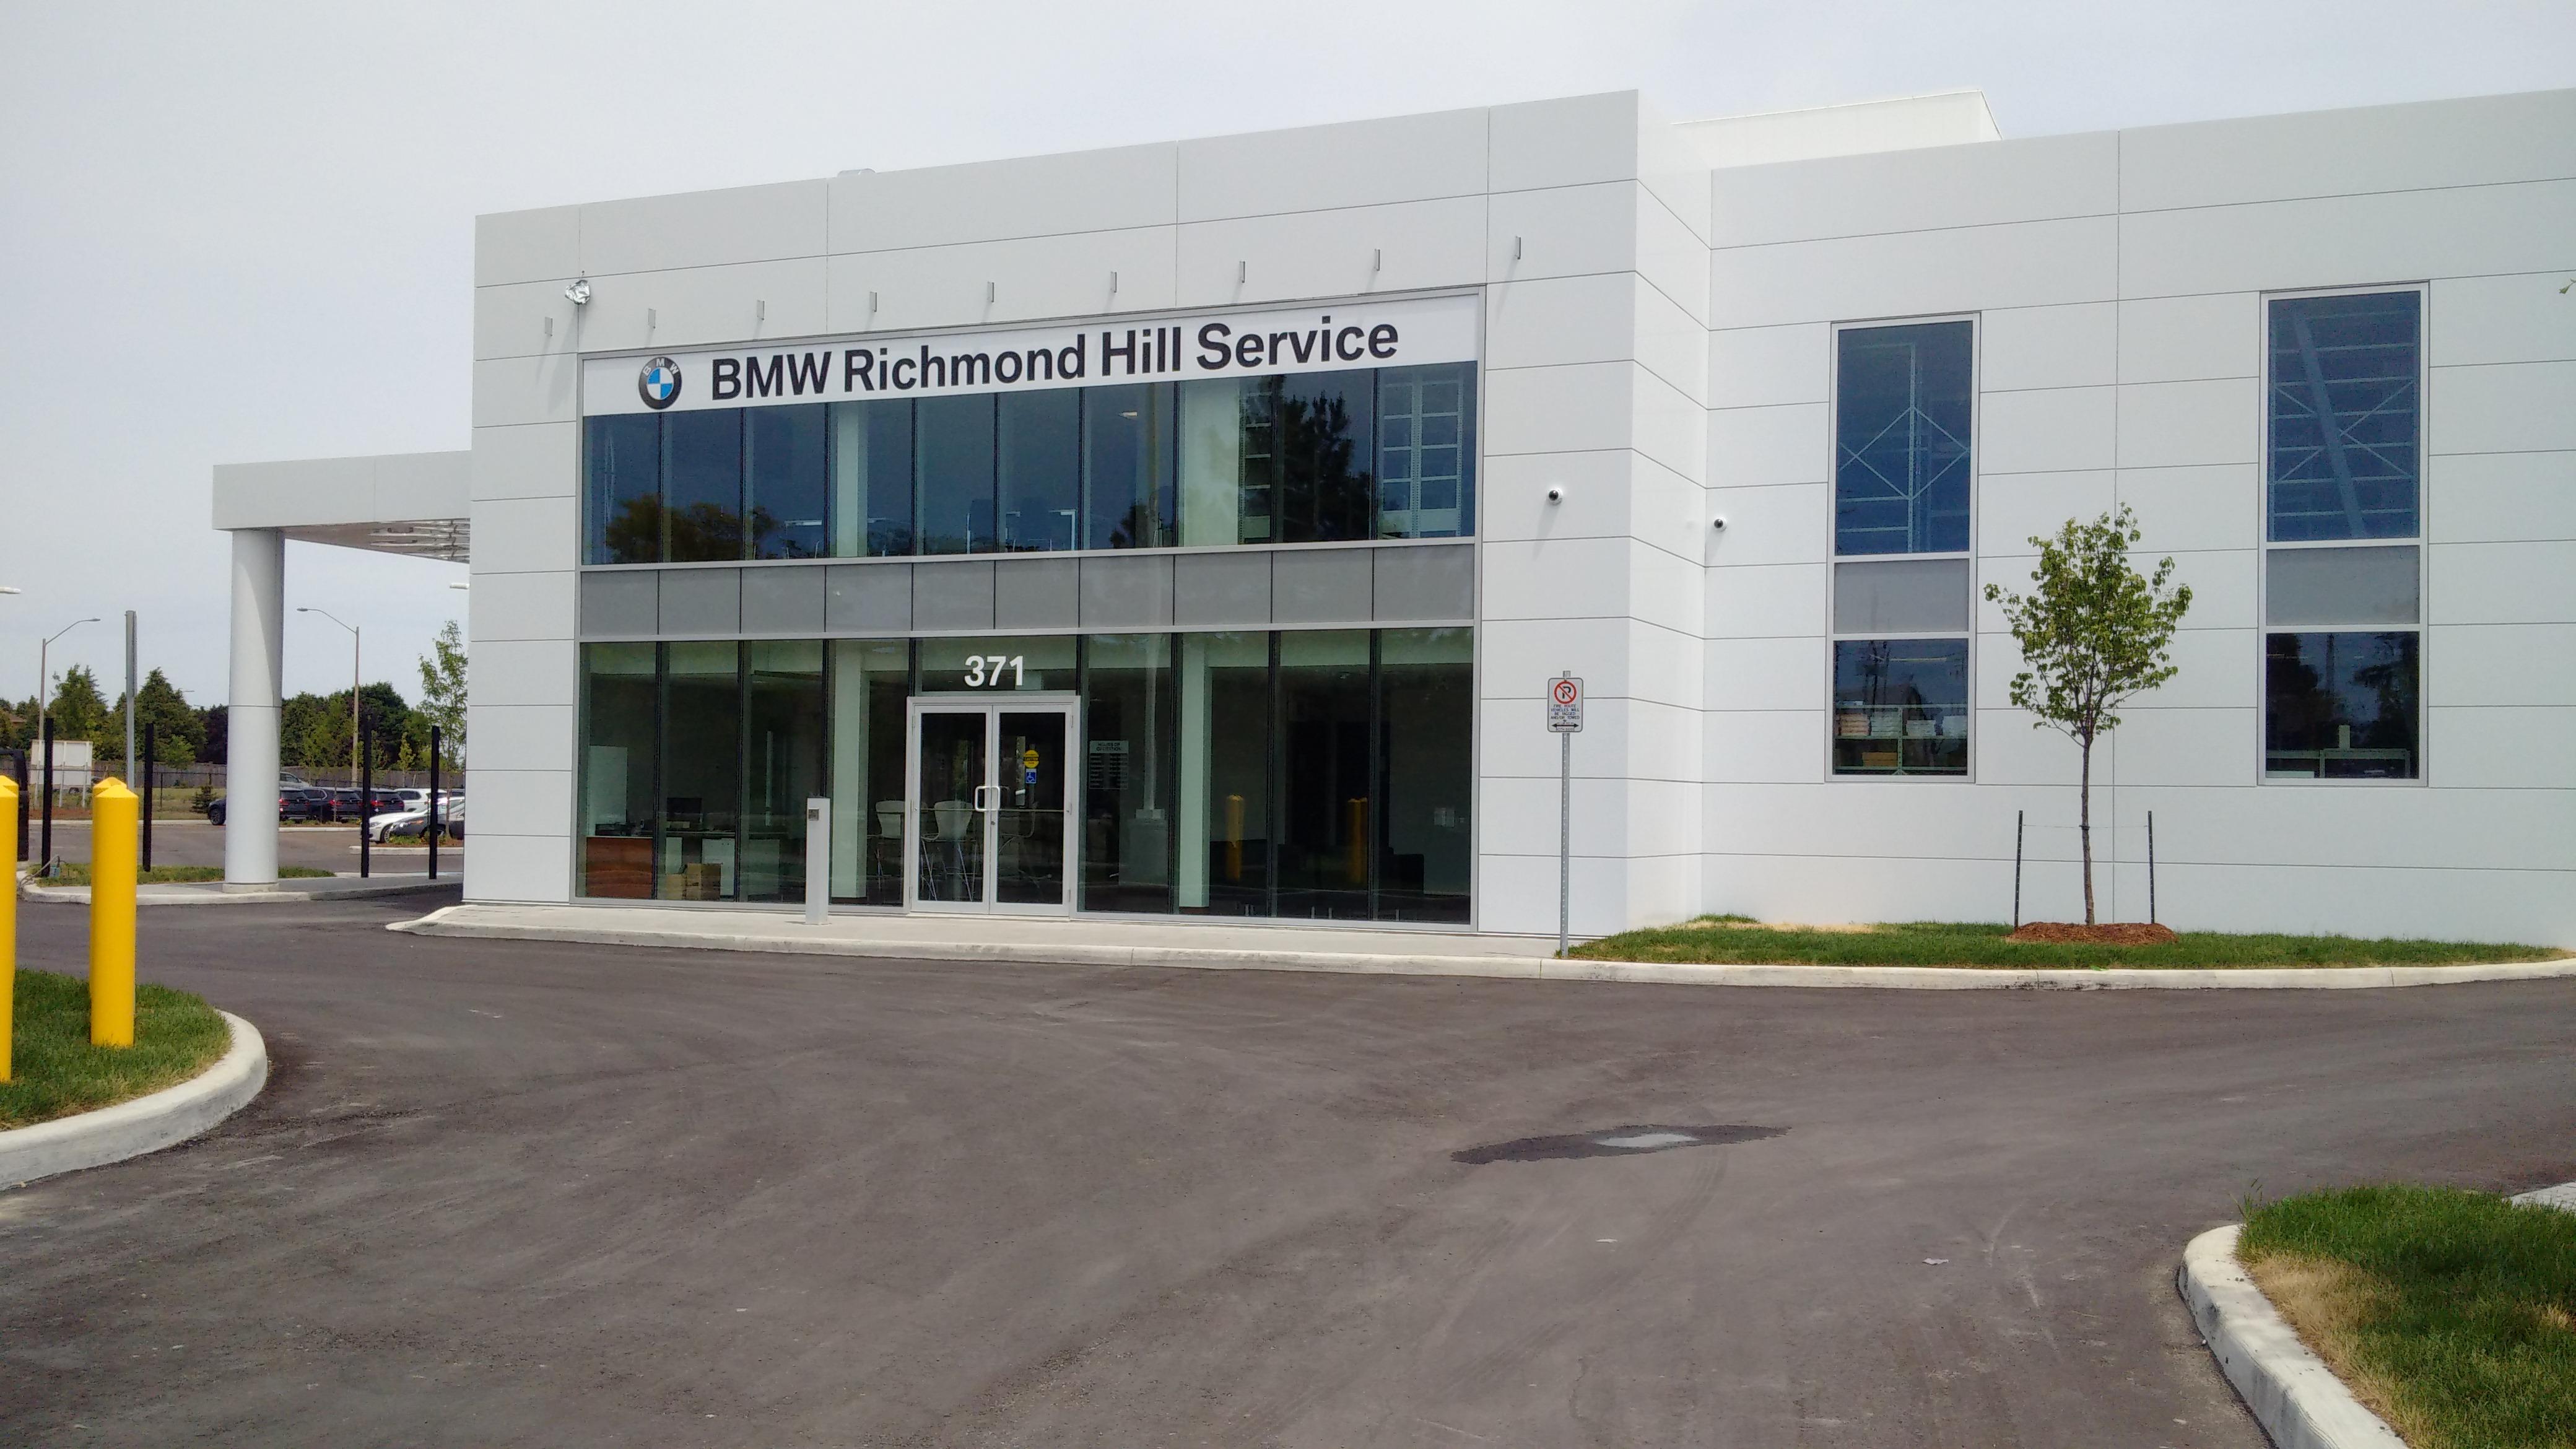 bmw richmond hill service bmw autohaus. Black Bedroom Furniture Sets. Home Design Ideas